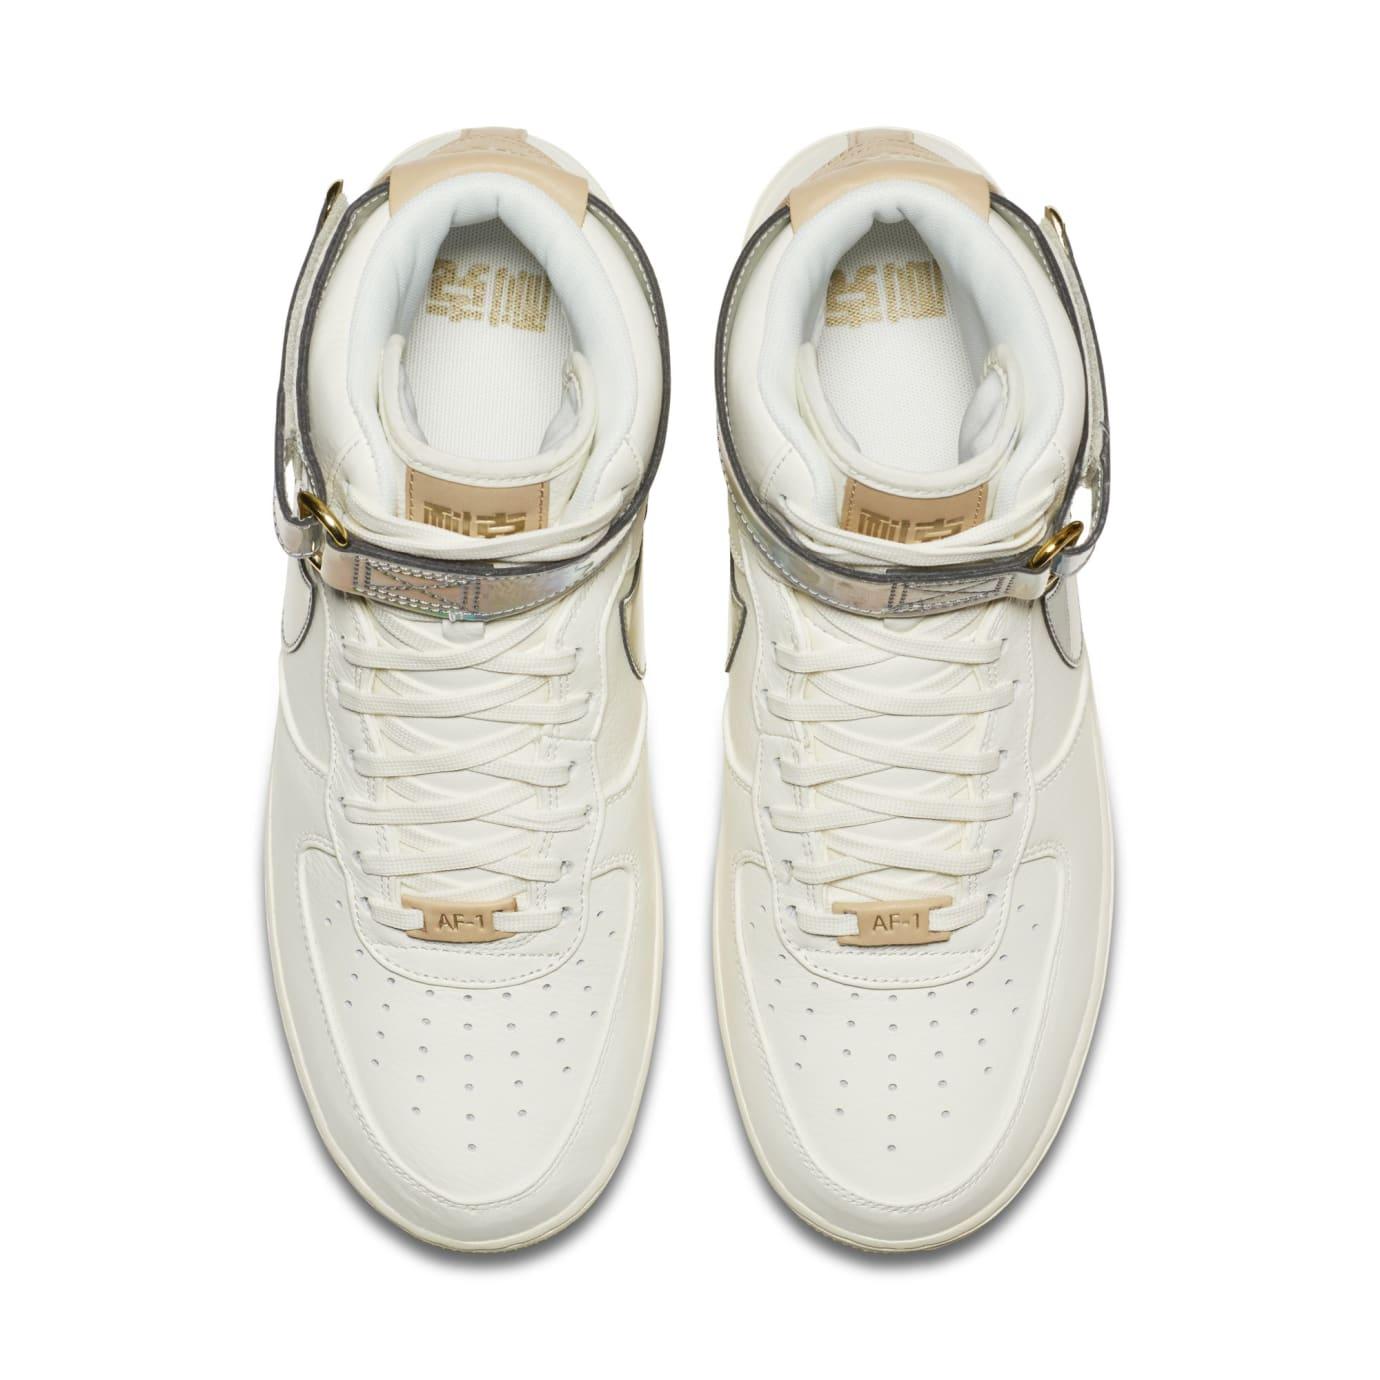 Nike Air Force 1 High 'Nai Ke/The Bund' (Top)